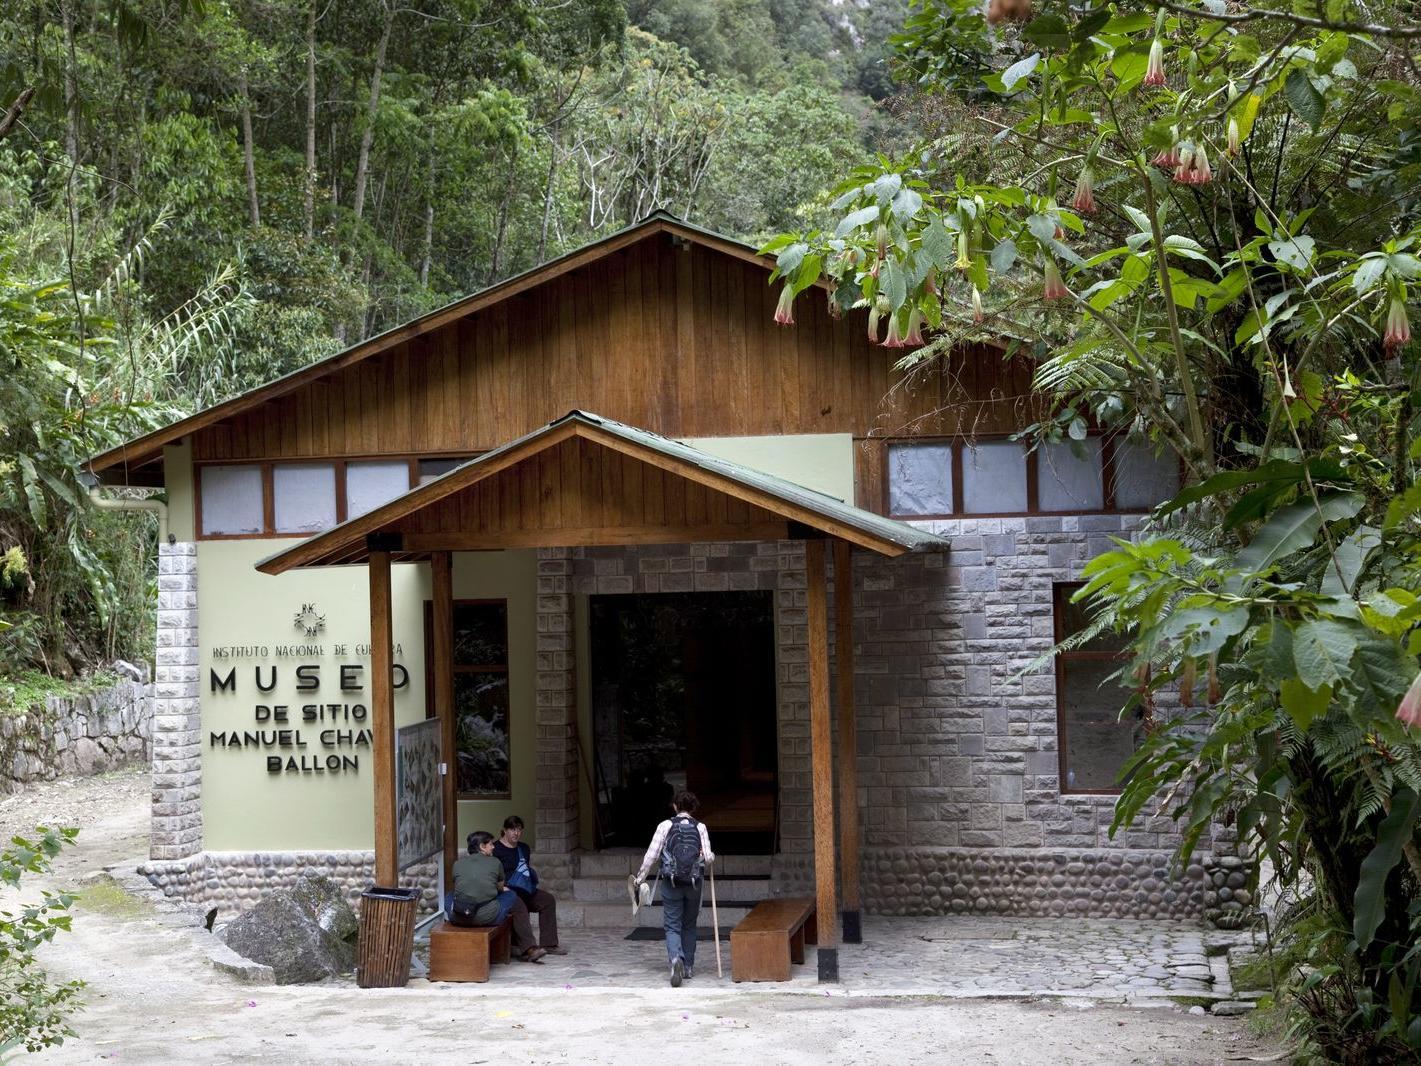 Exterior view of Machu Picchu Museum near Hotel Sumaq